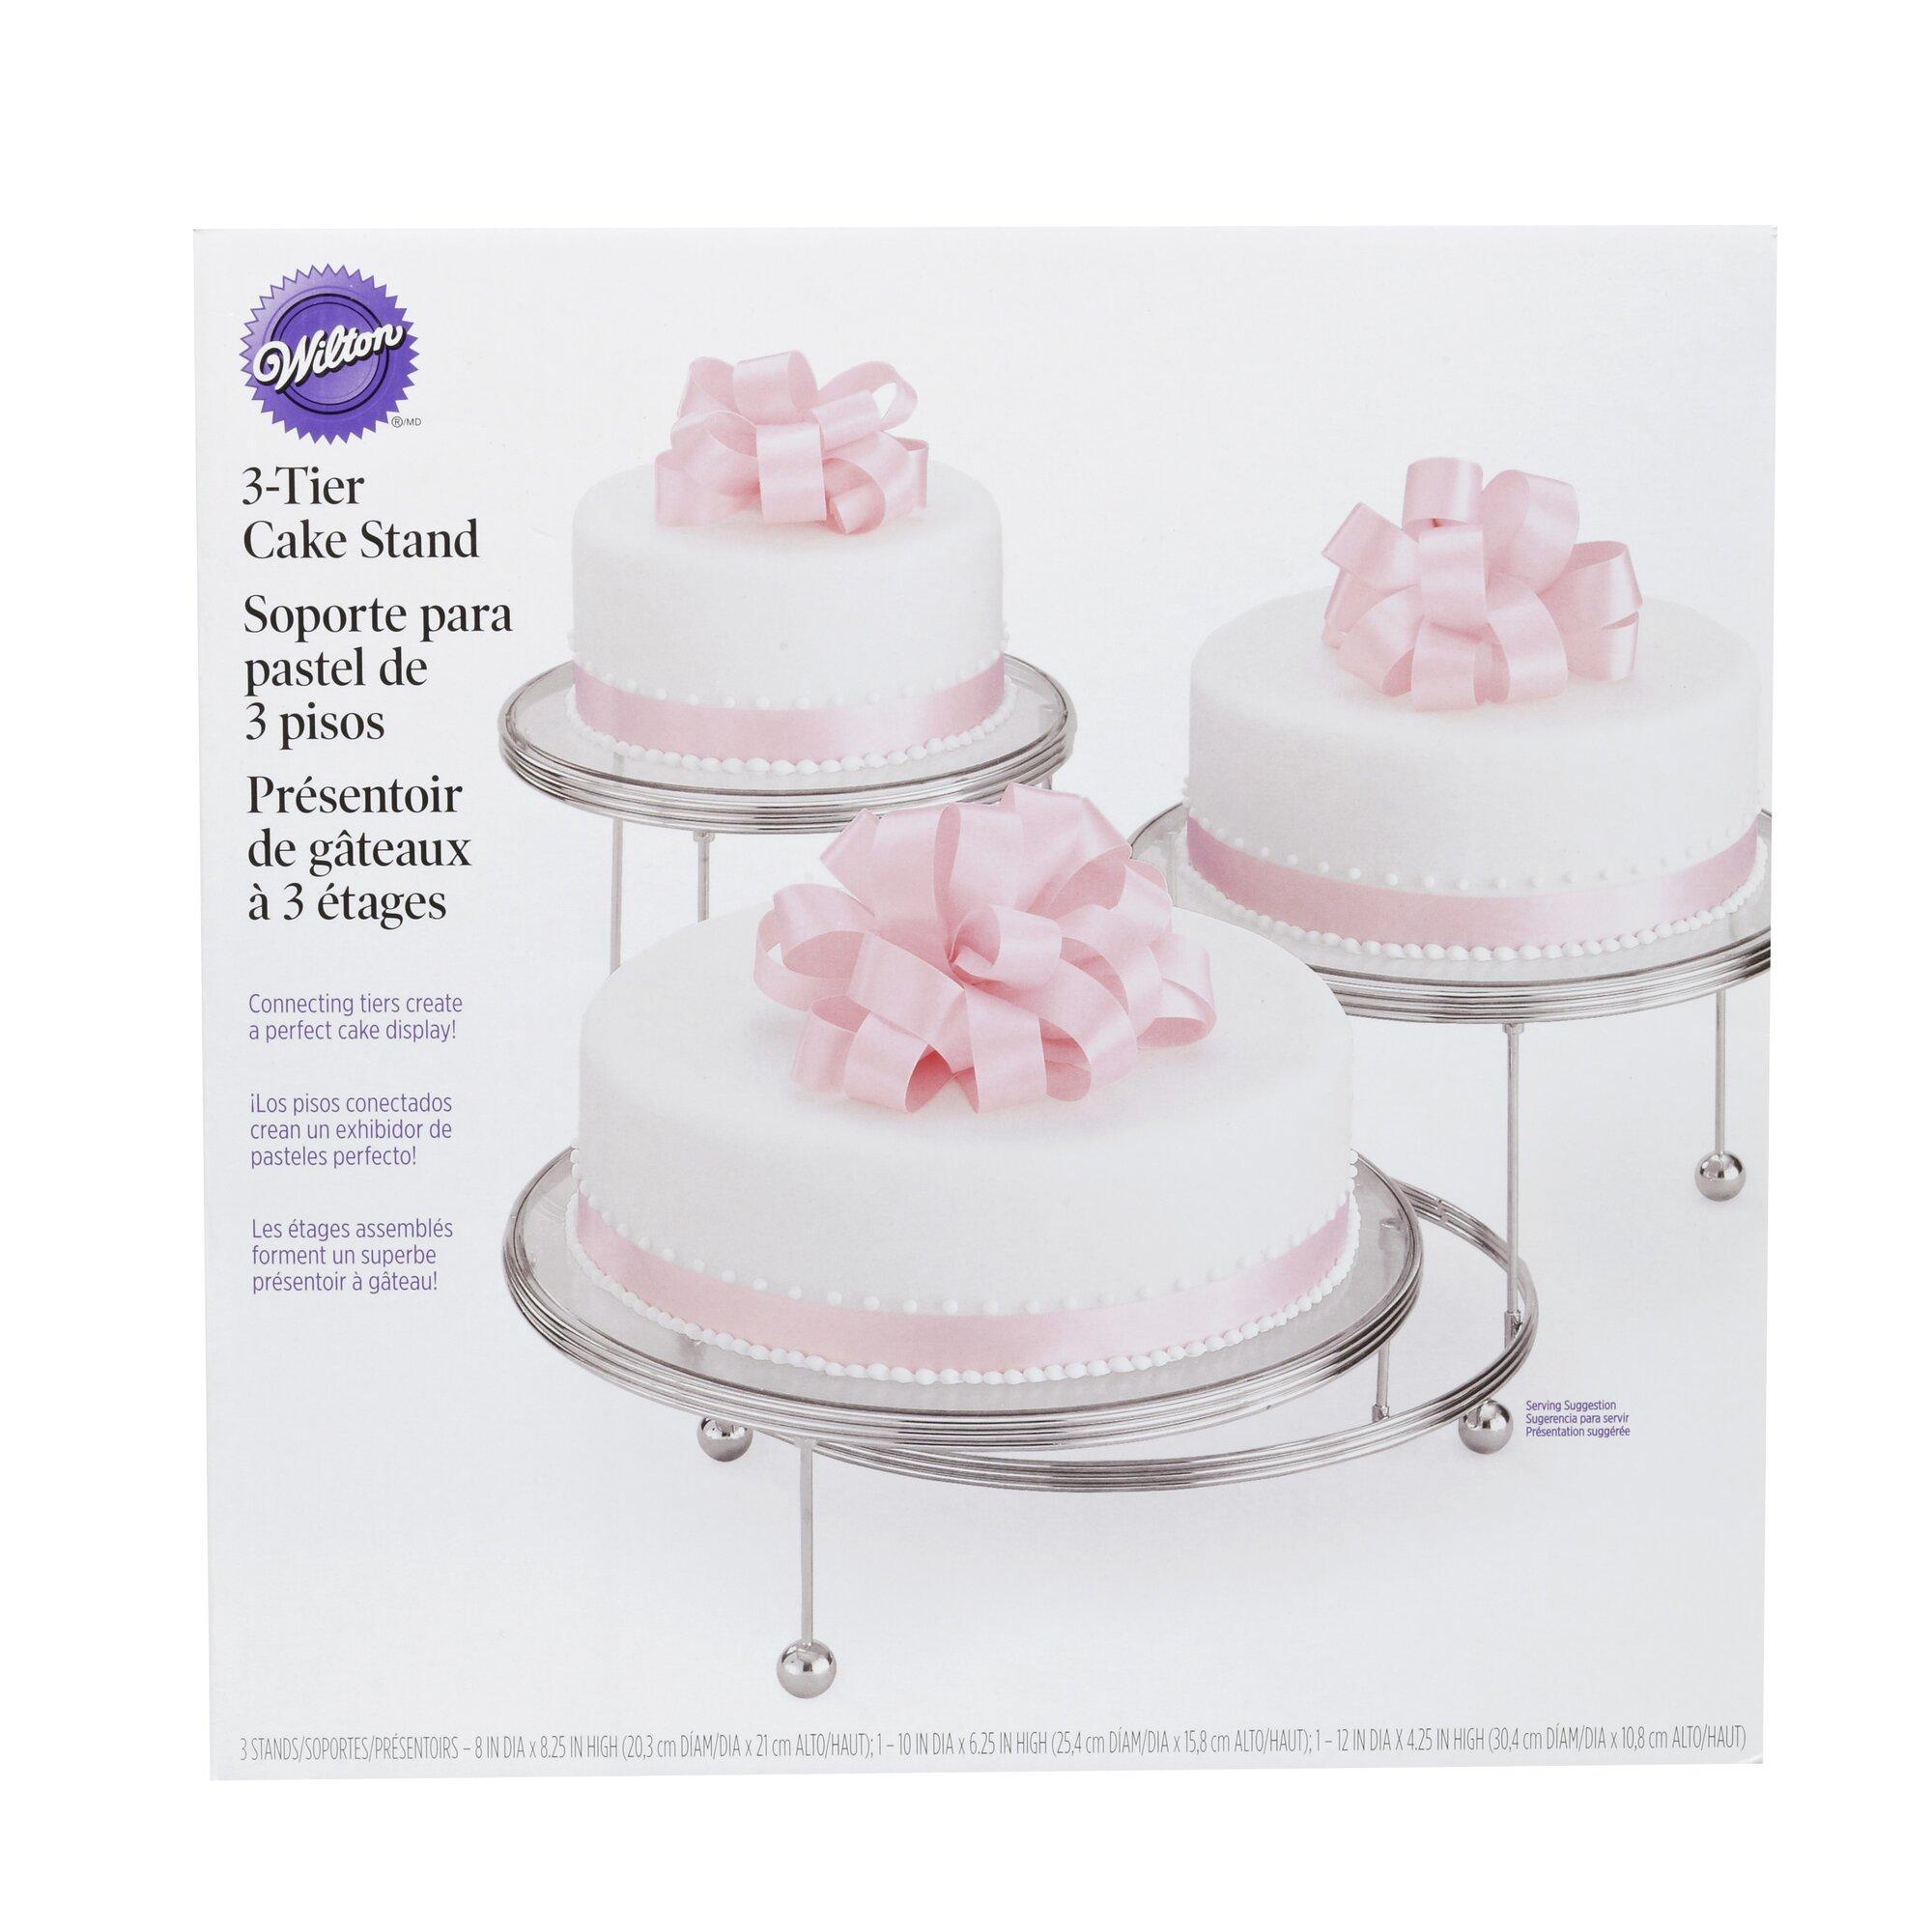 Modern Wilton Cake Stands Wedding Cakes Pics Designs – Dievoon